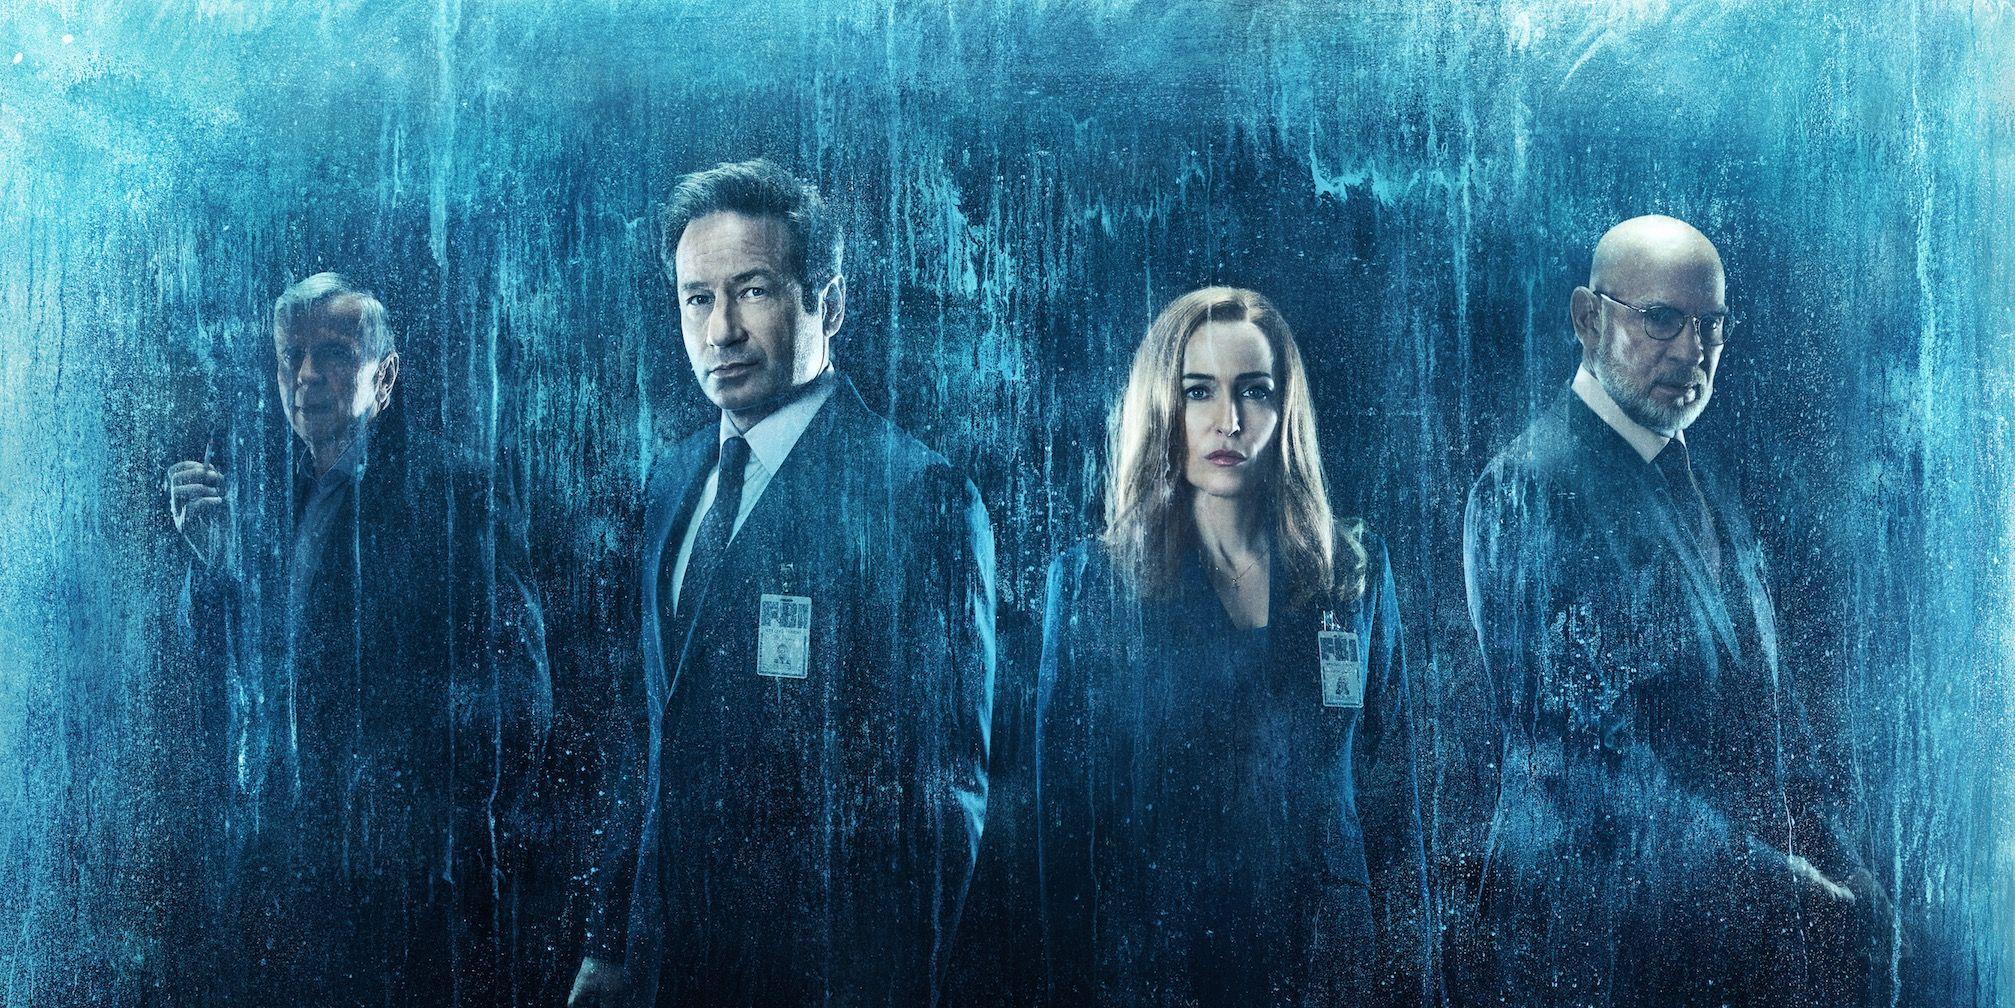 'The X-Files' season 11